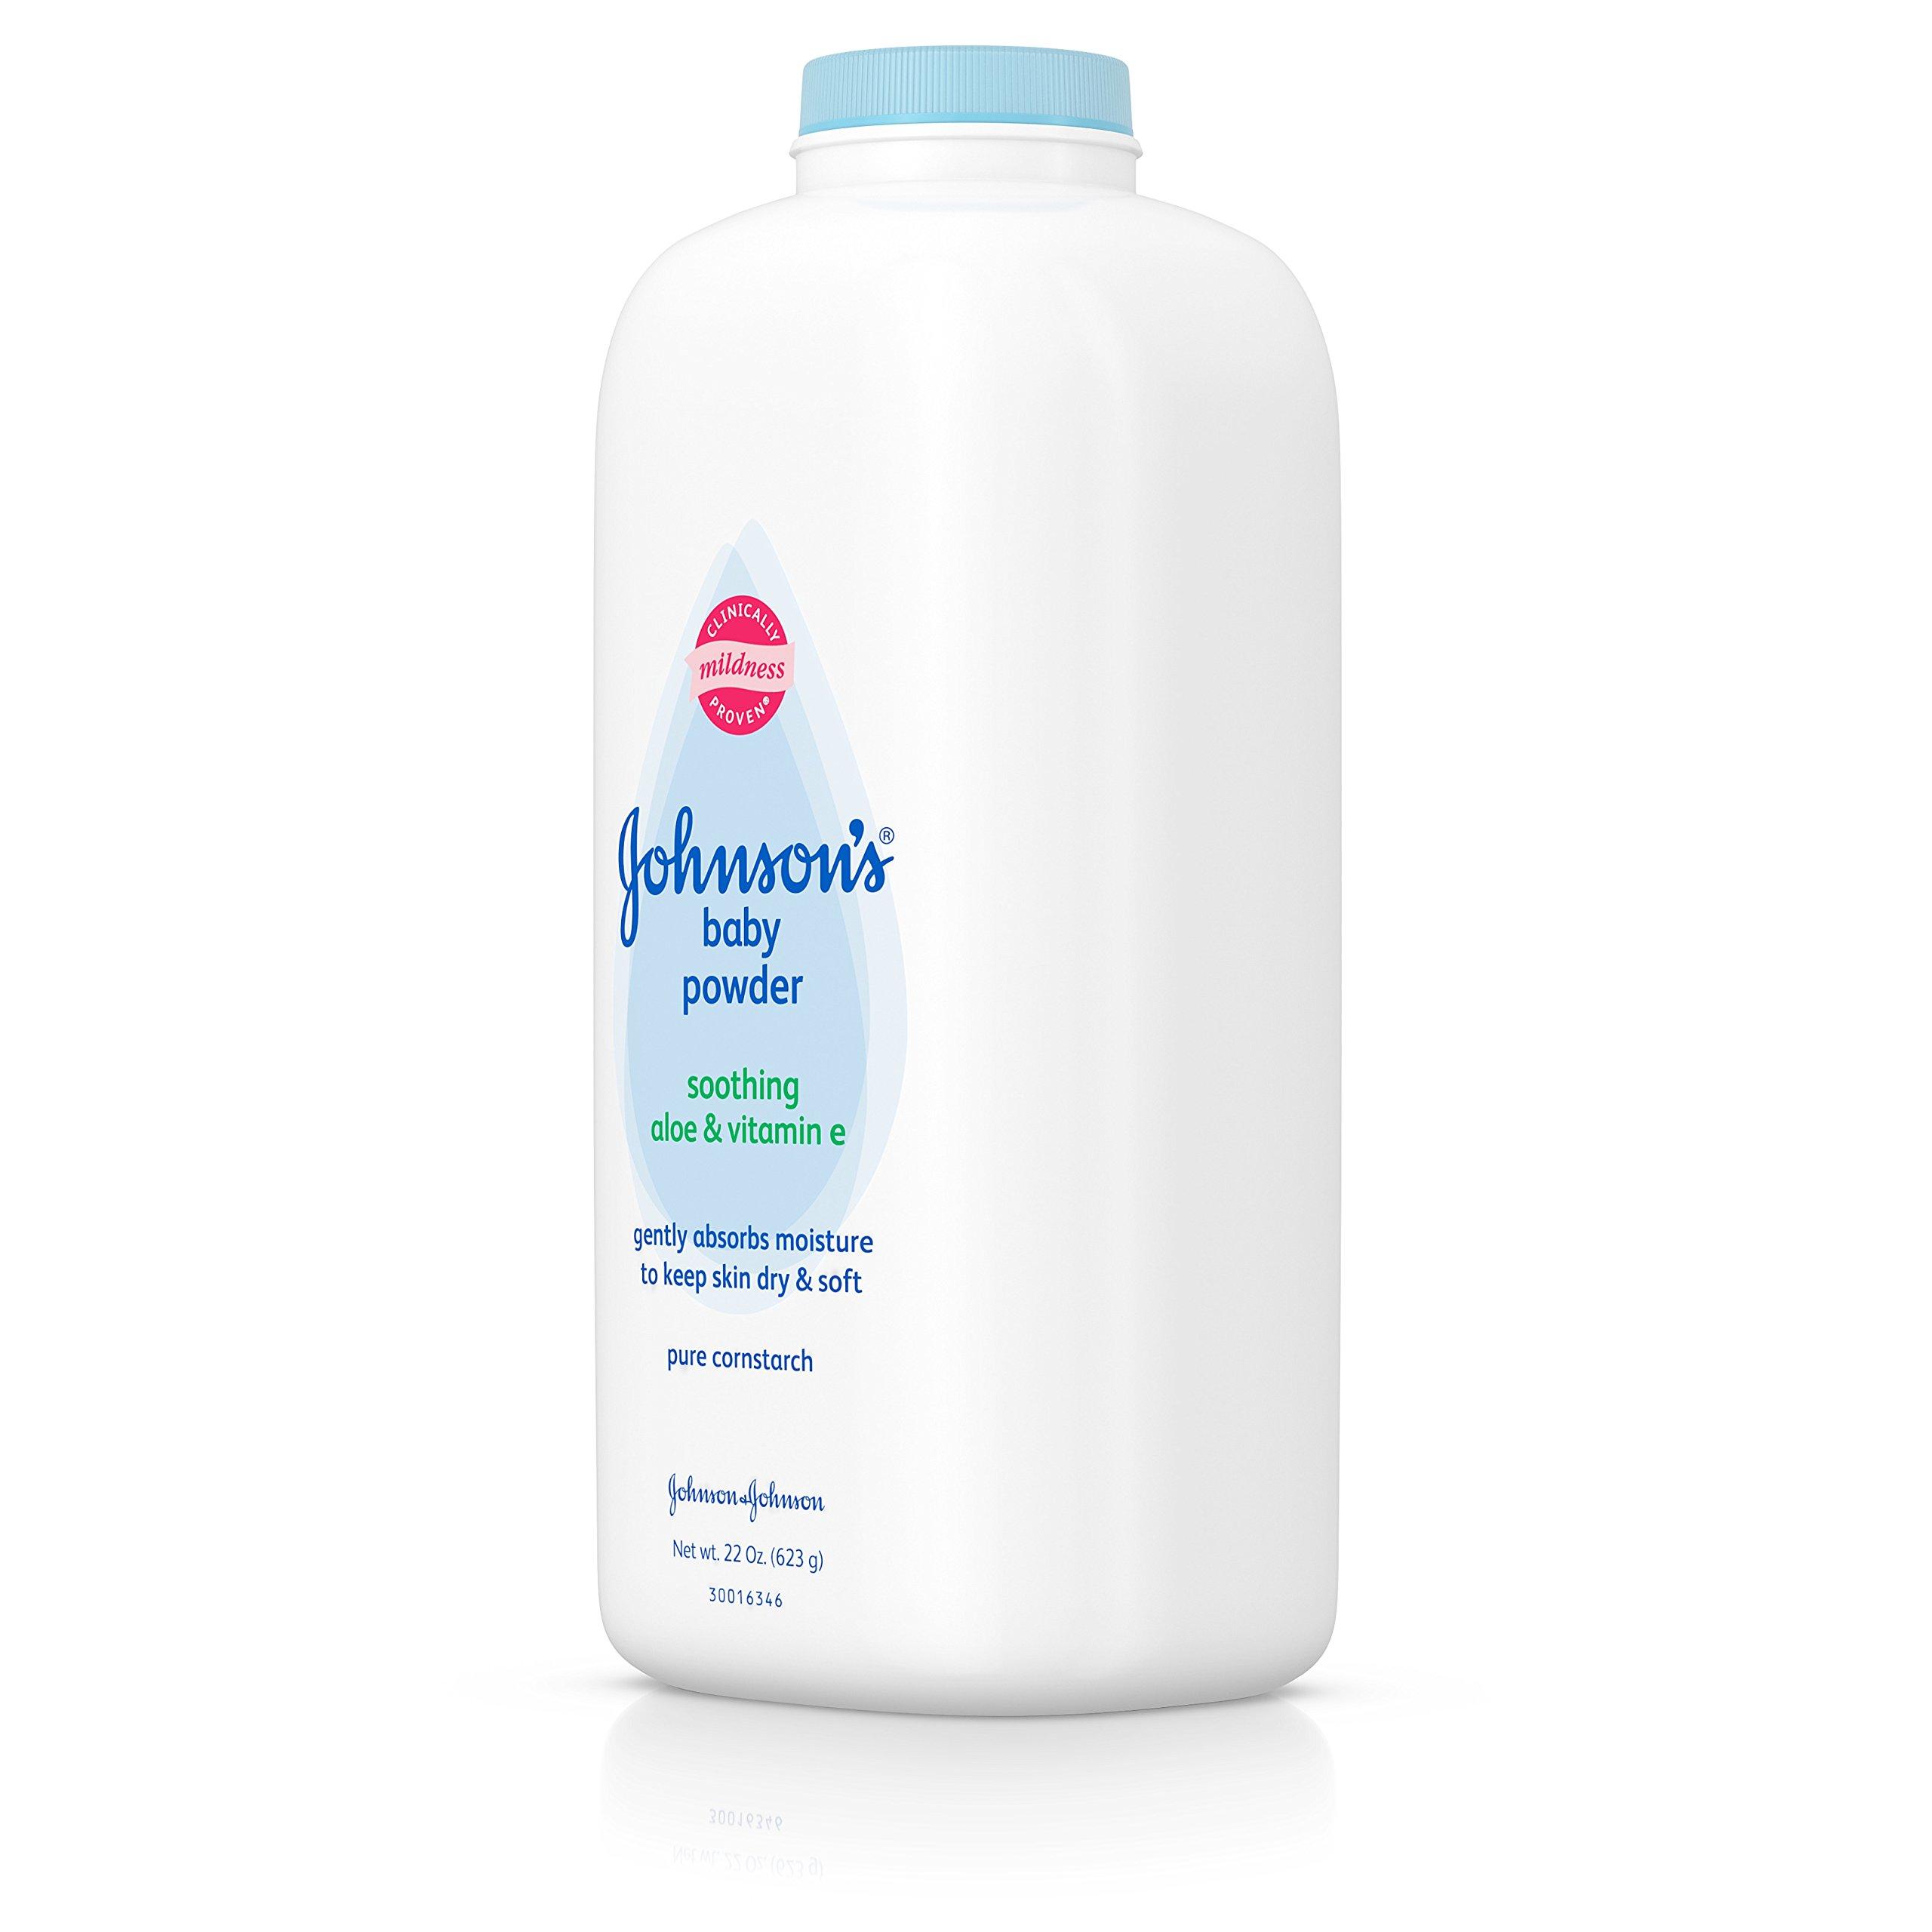 Johnson's Baby Powder With Aloe Vera & Vitamin E, Diaper Rash Protection, 22 Oz. (Pack of 6) by Johnson's Baby (Image #9)